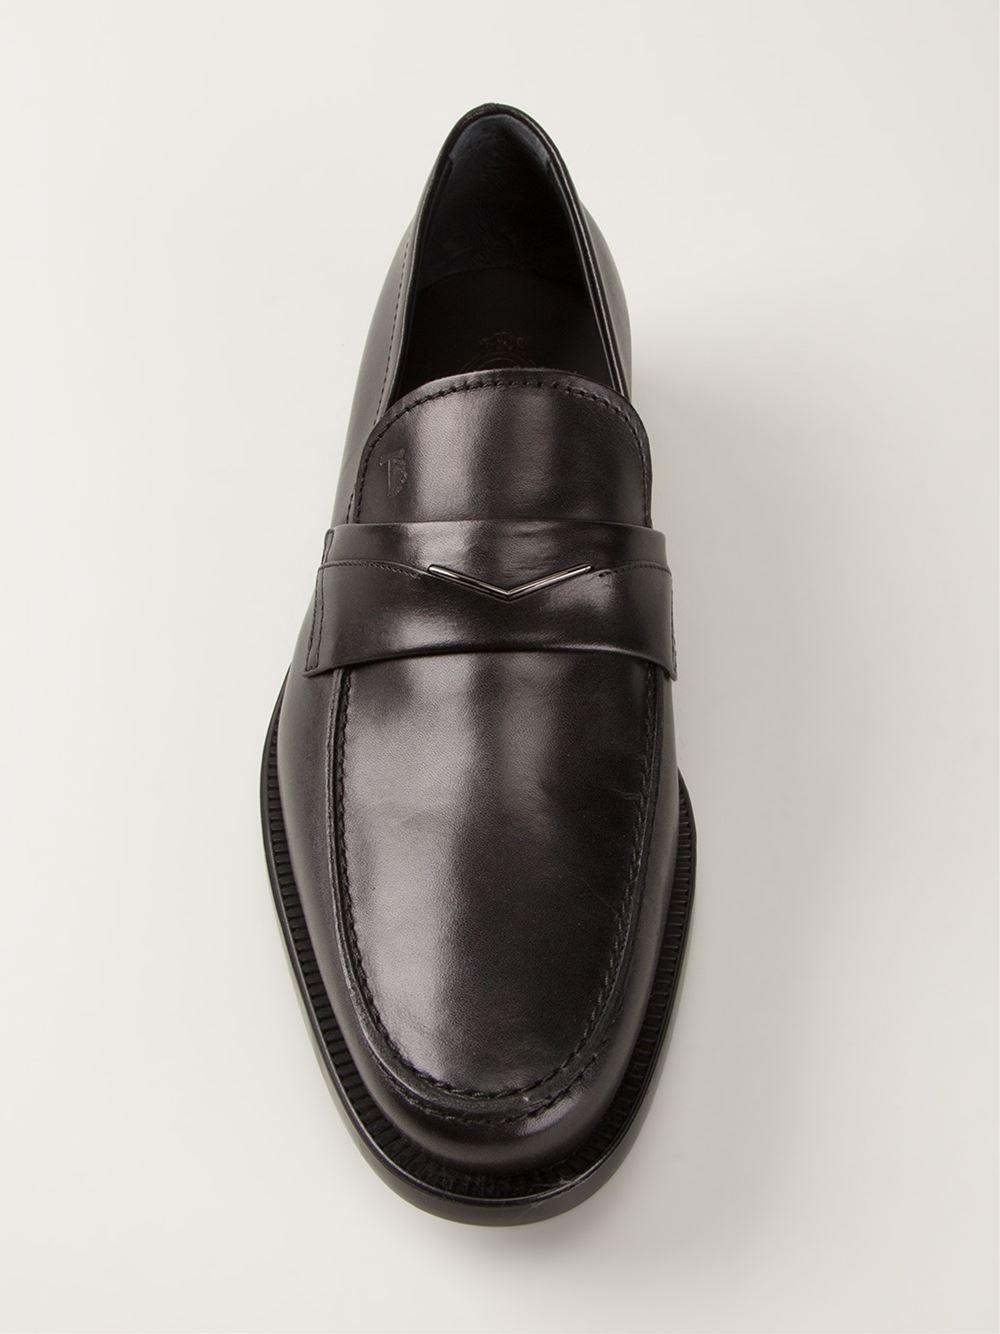 classic Penny loafers - Black Tod's 9qRQu8dkp3